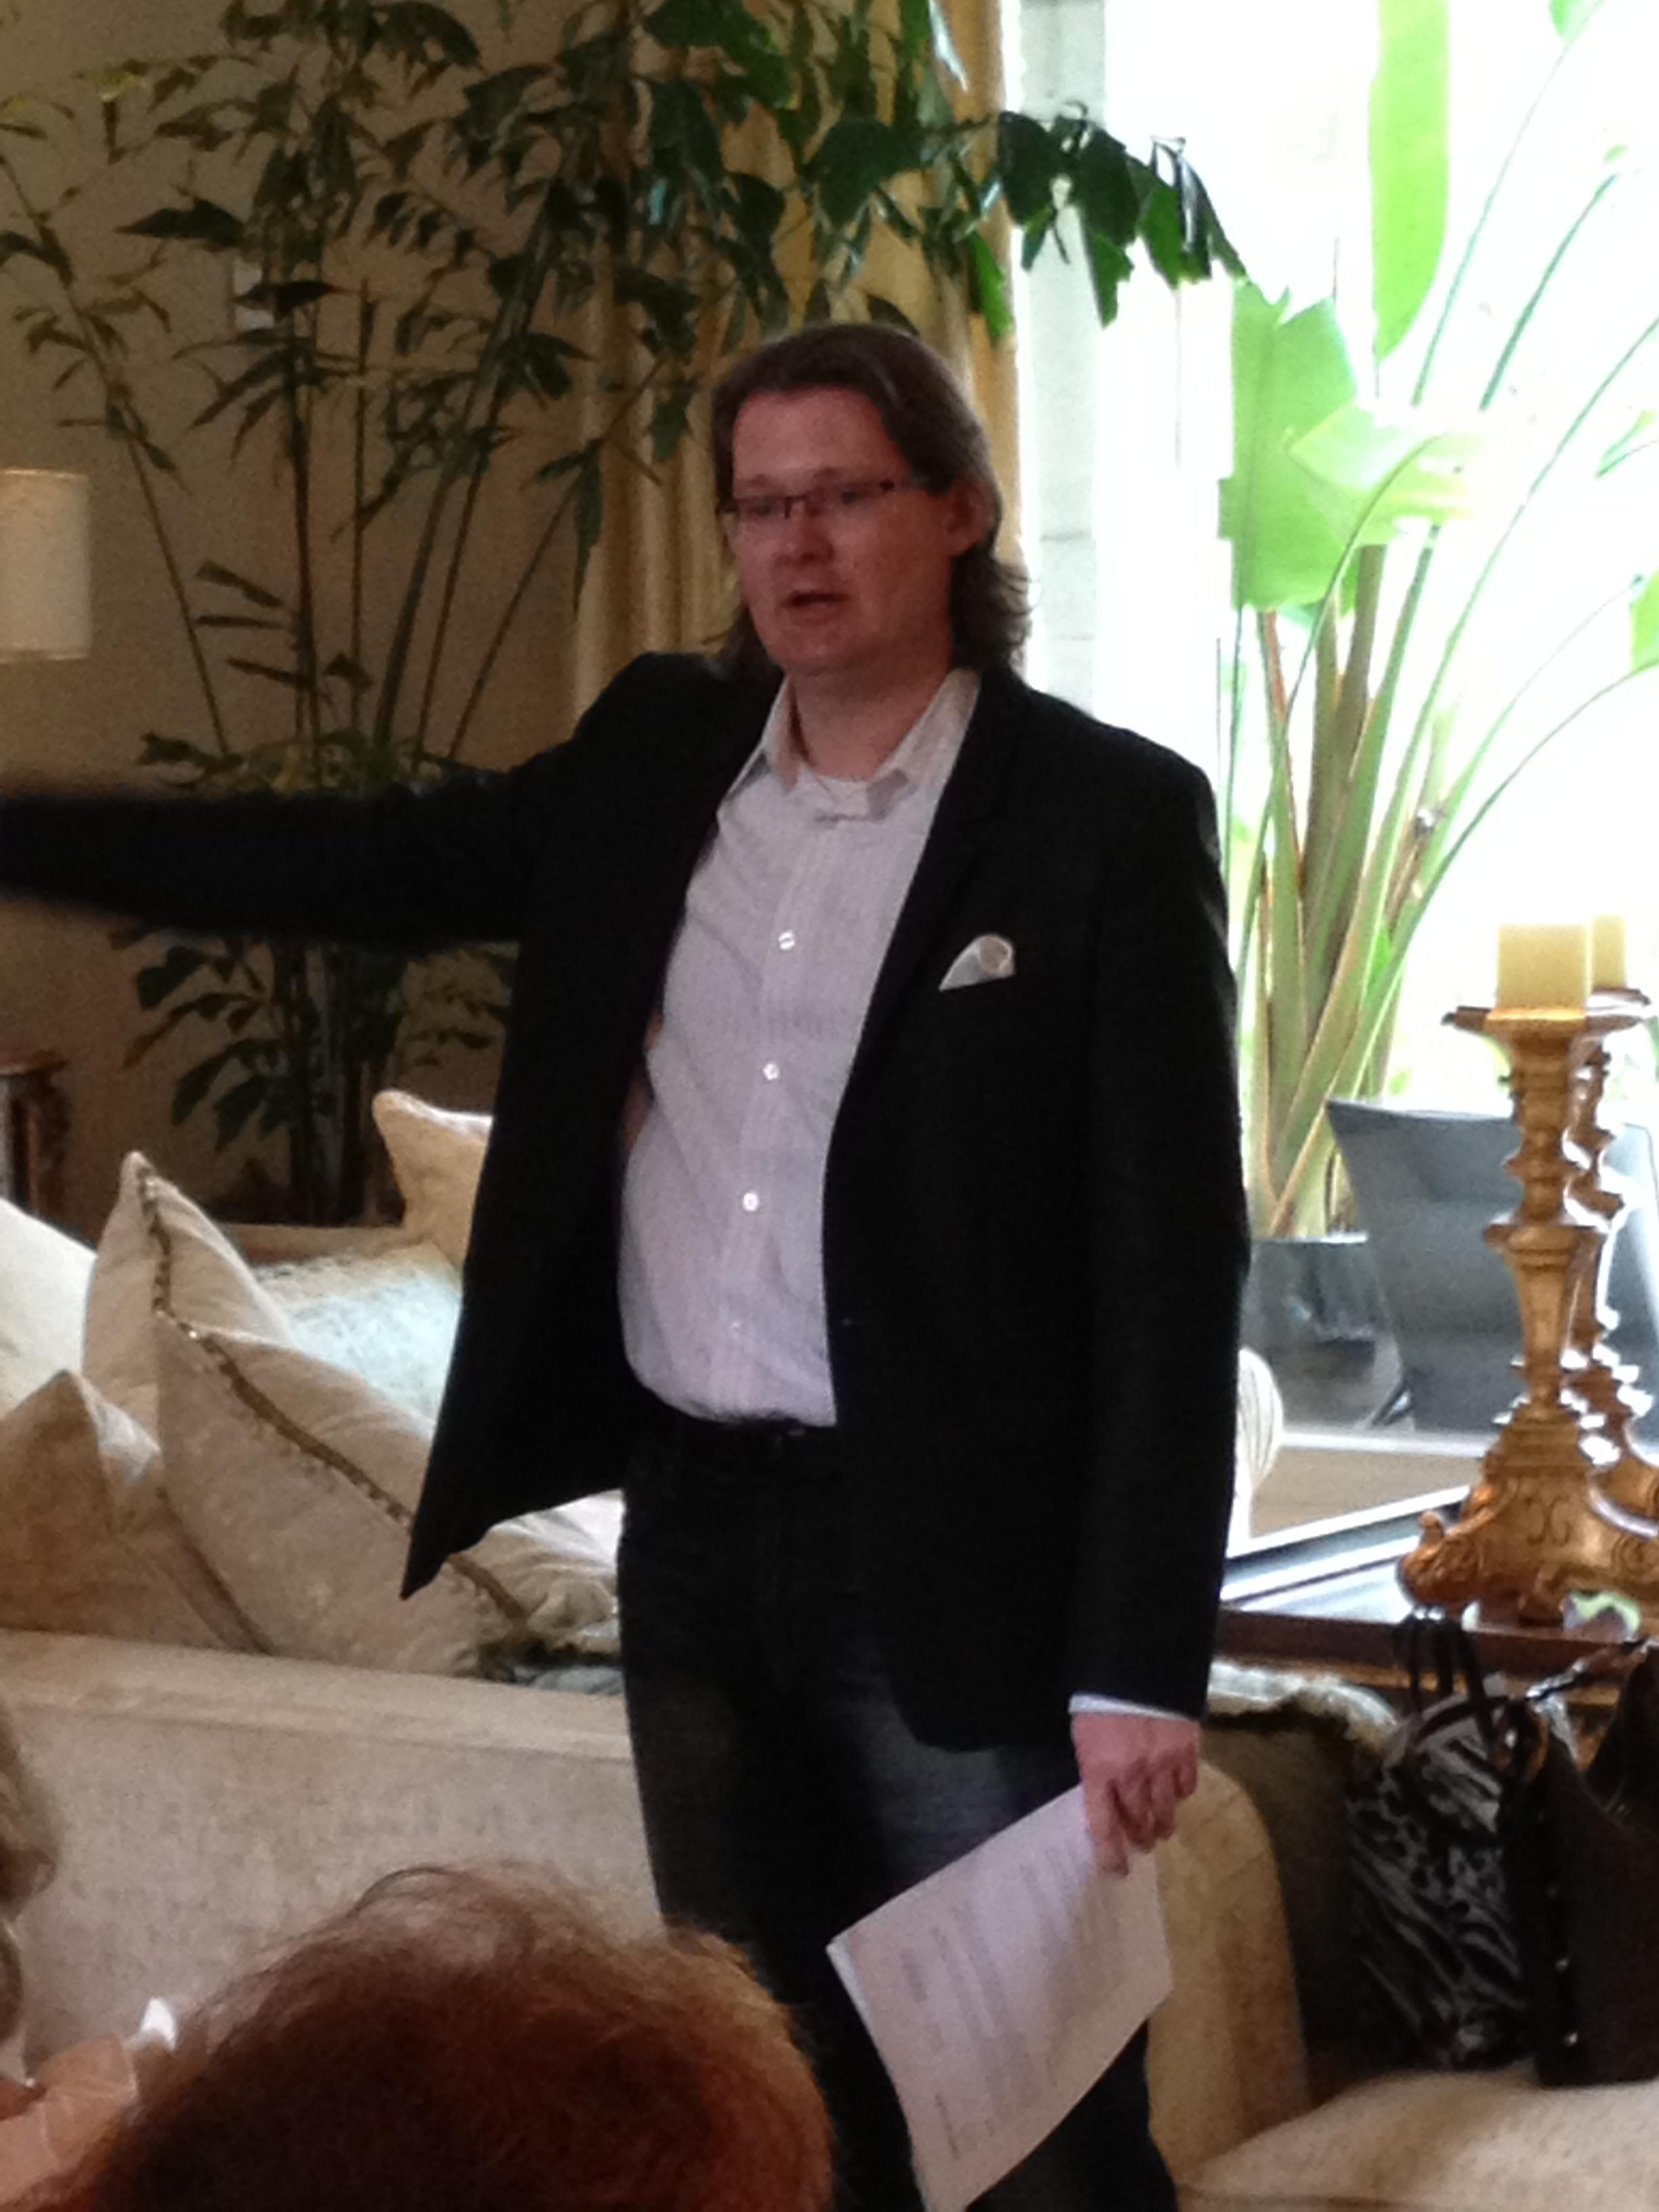 Robert Teaching - Houston 2012